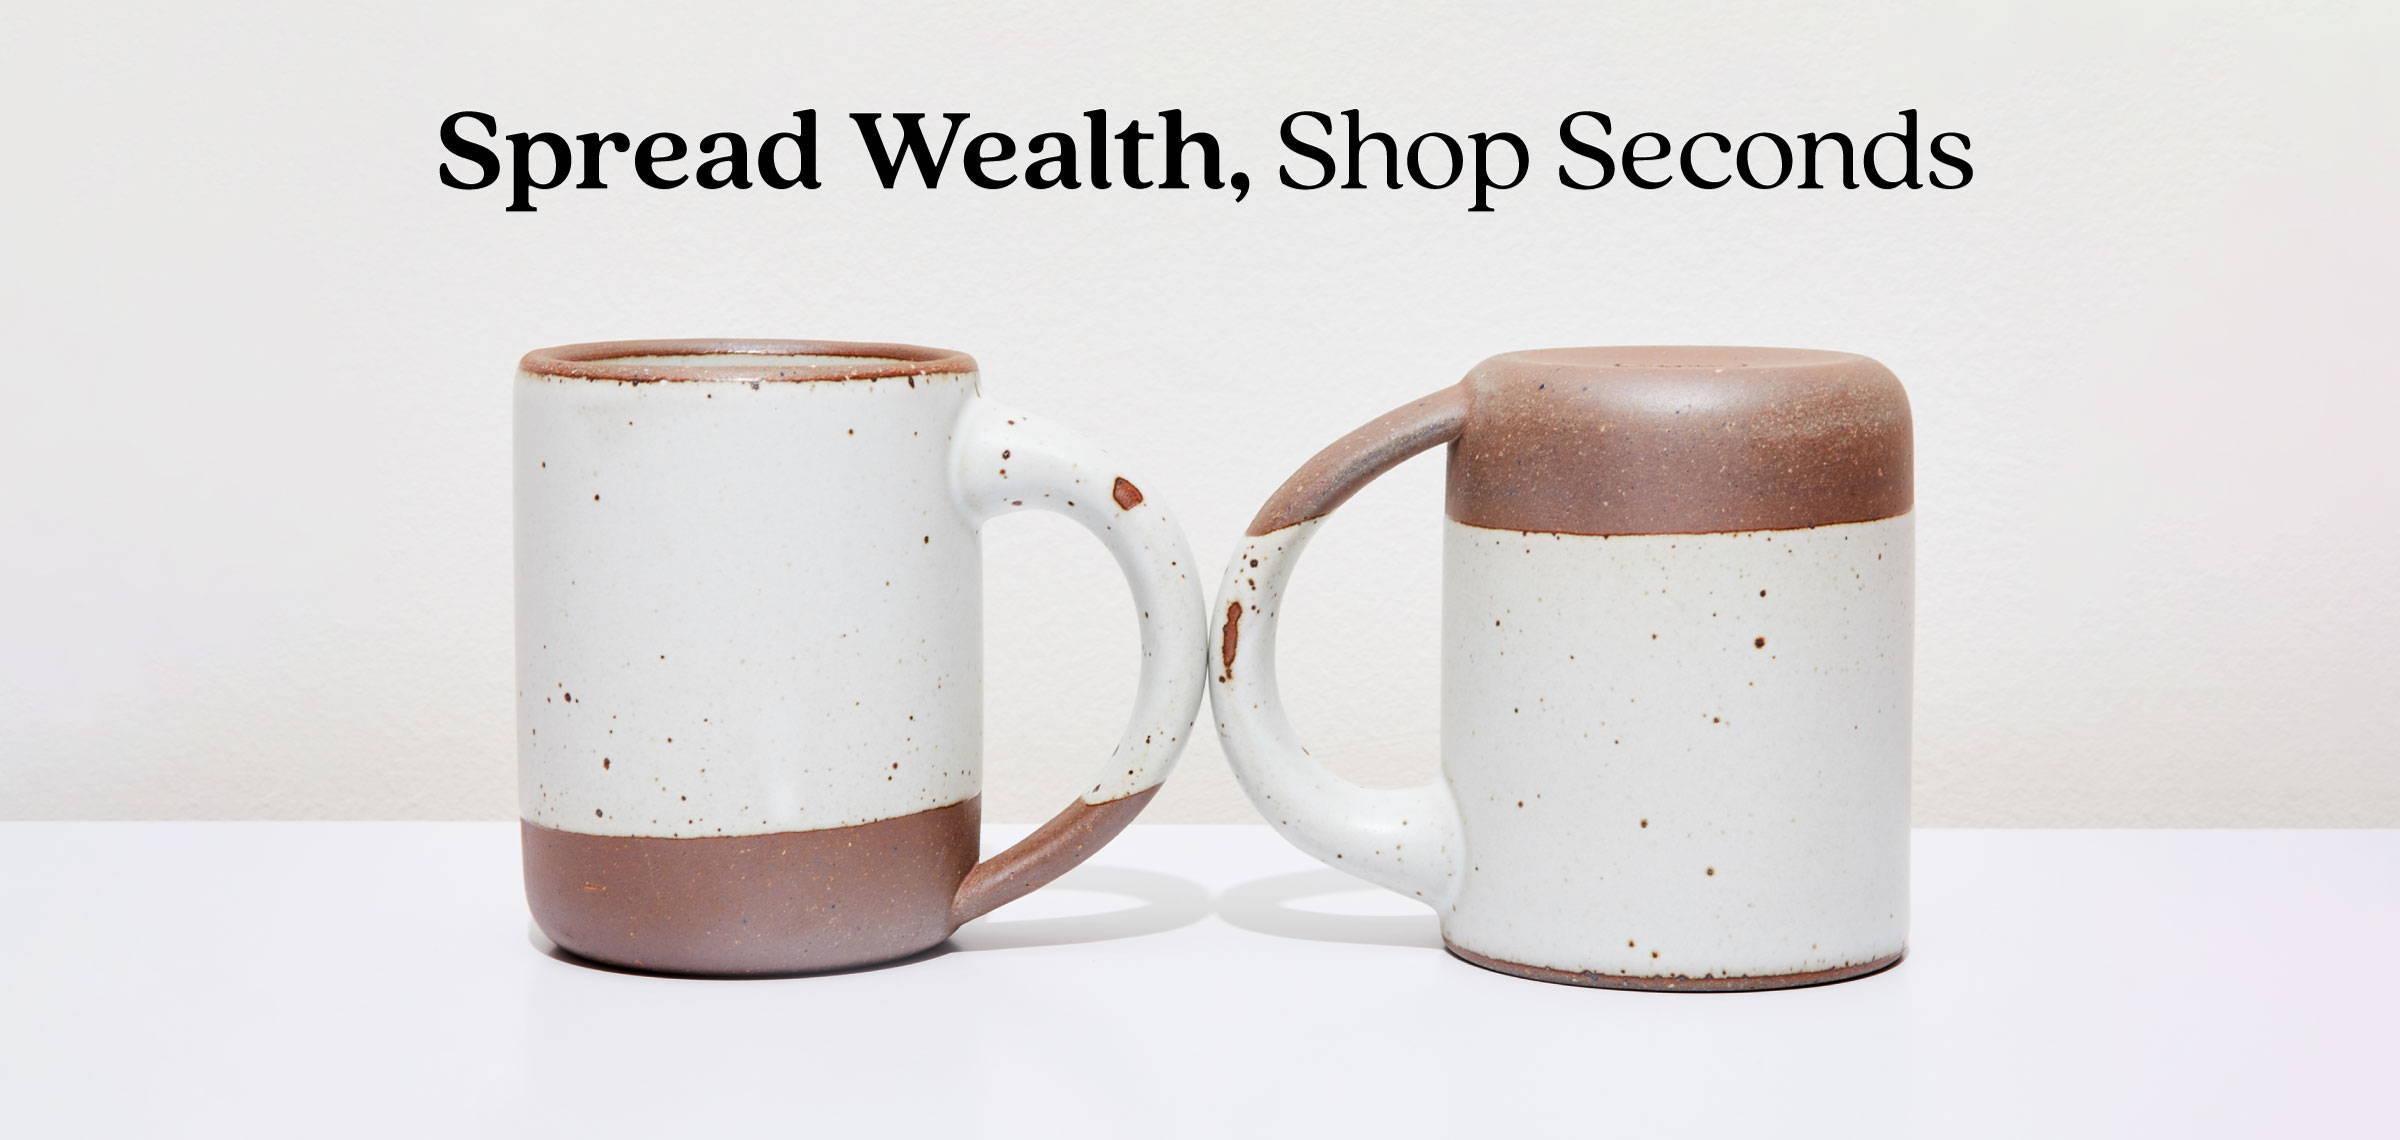 Spread wealth, shop seconds